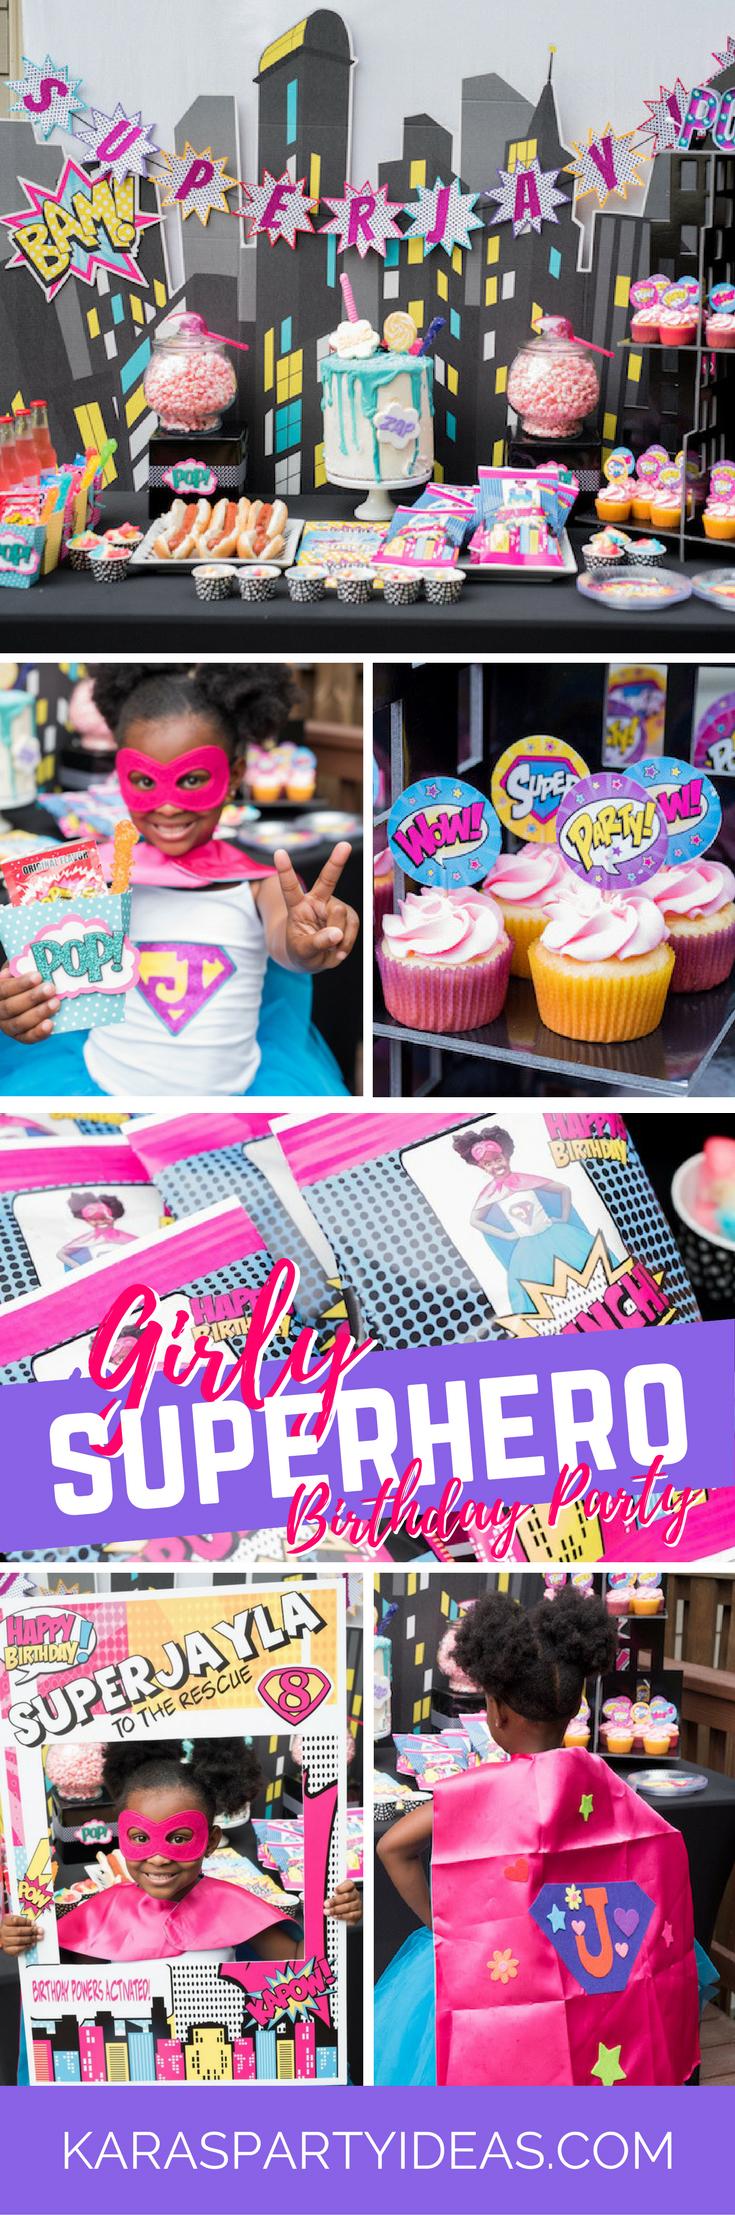 Girly Superhero Birthday Party via Kara's Party Ideas - KarasPartyIdeas.com